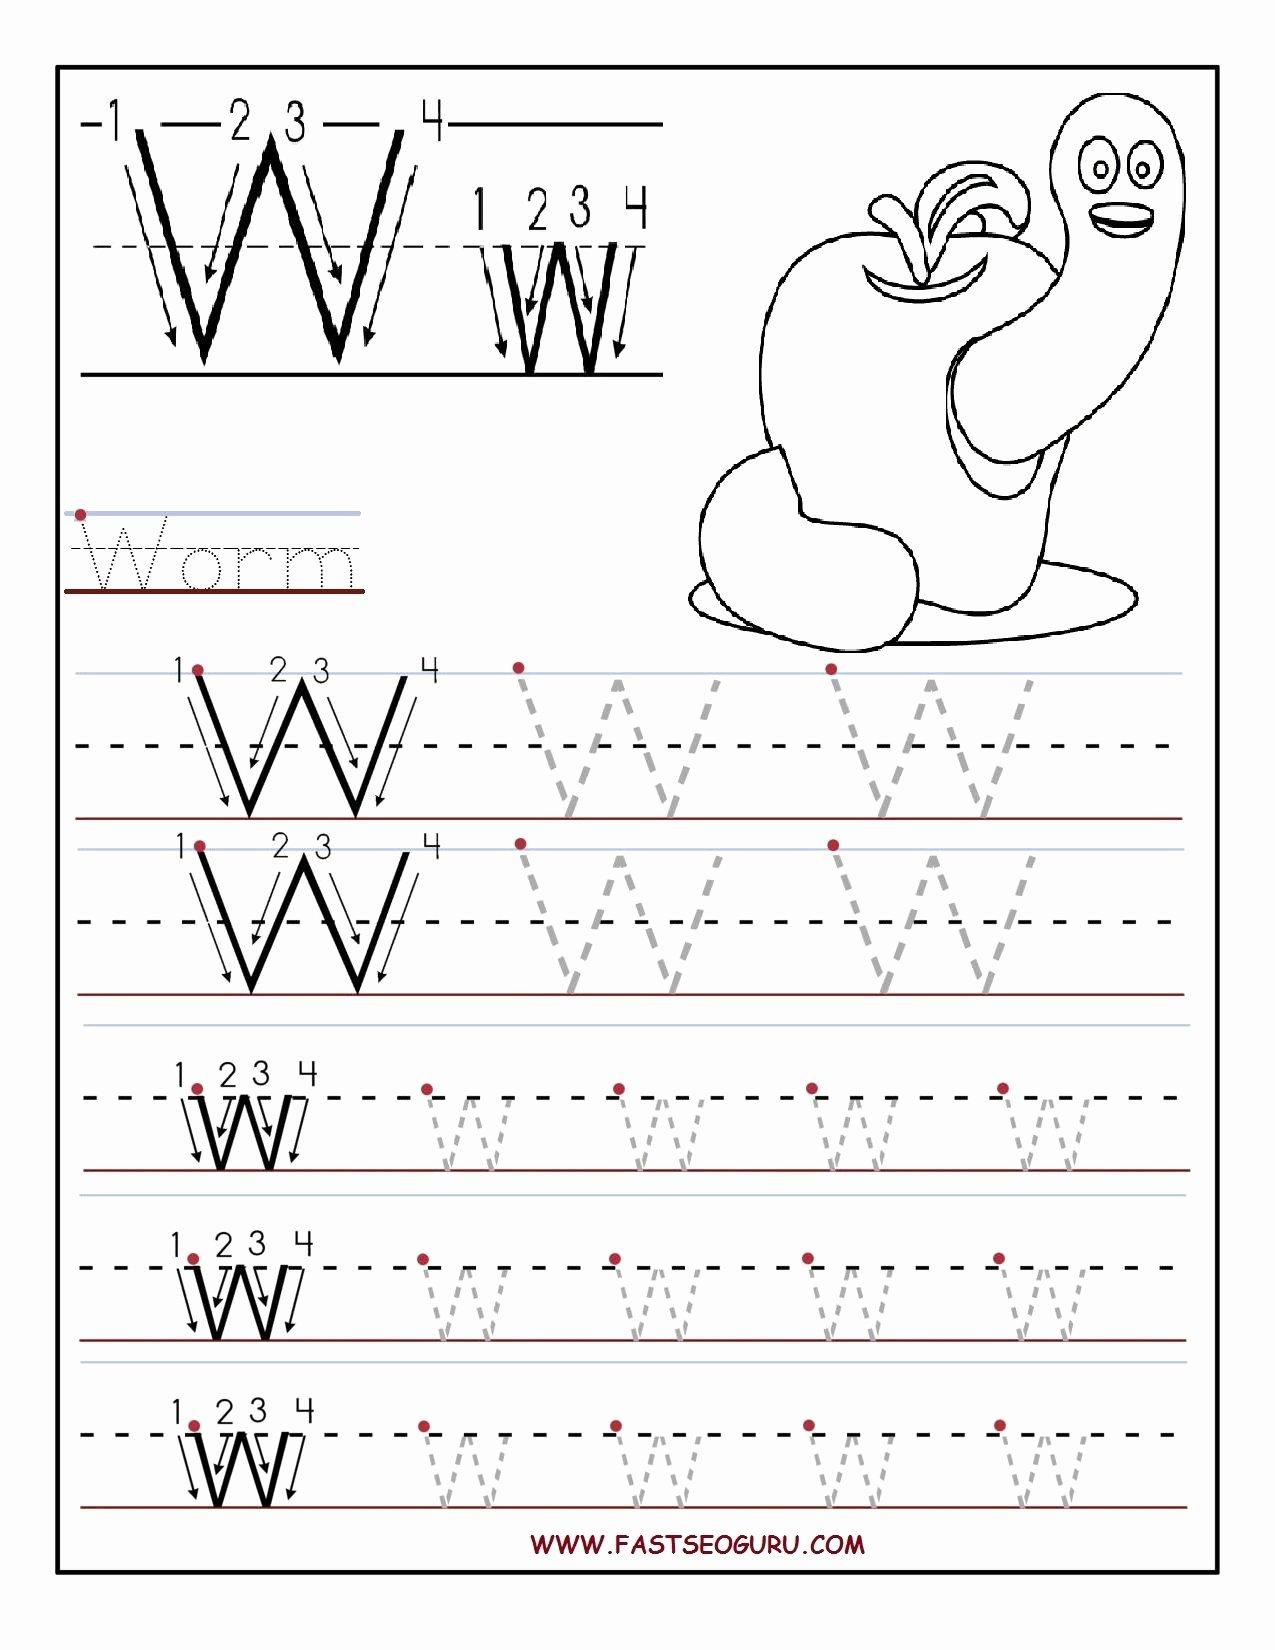 Letter W Worksheets for Preschoolers Best Of Printable Letter W Tracing Worksheets for Preschool